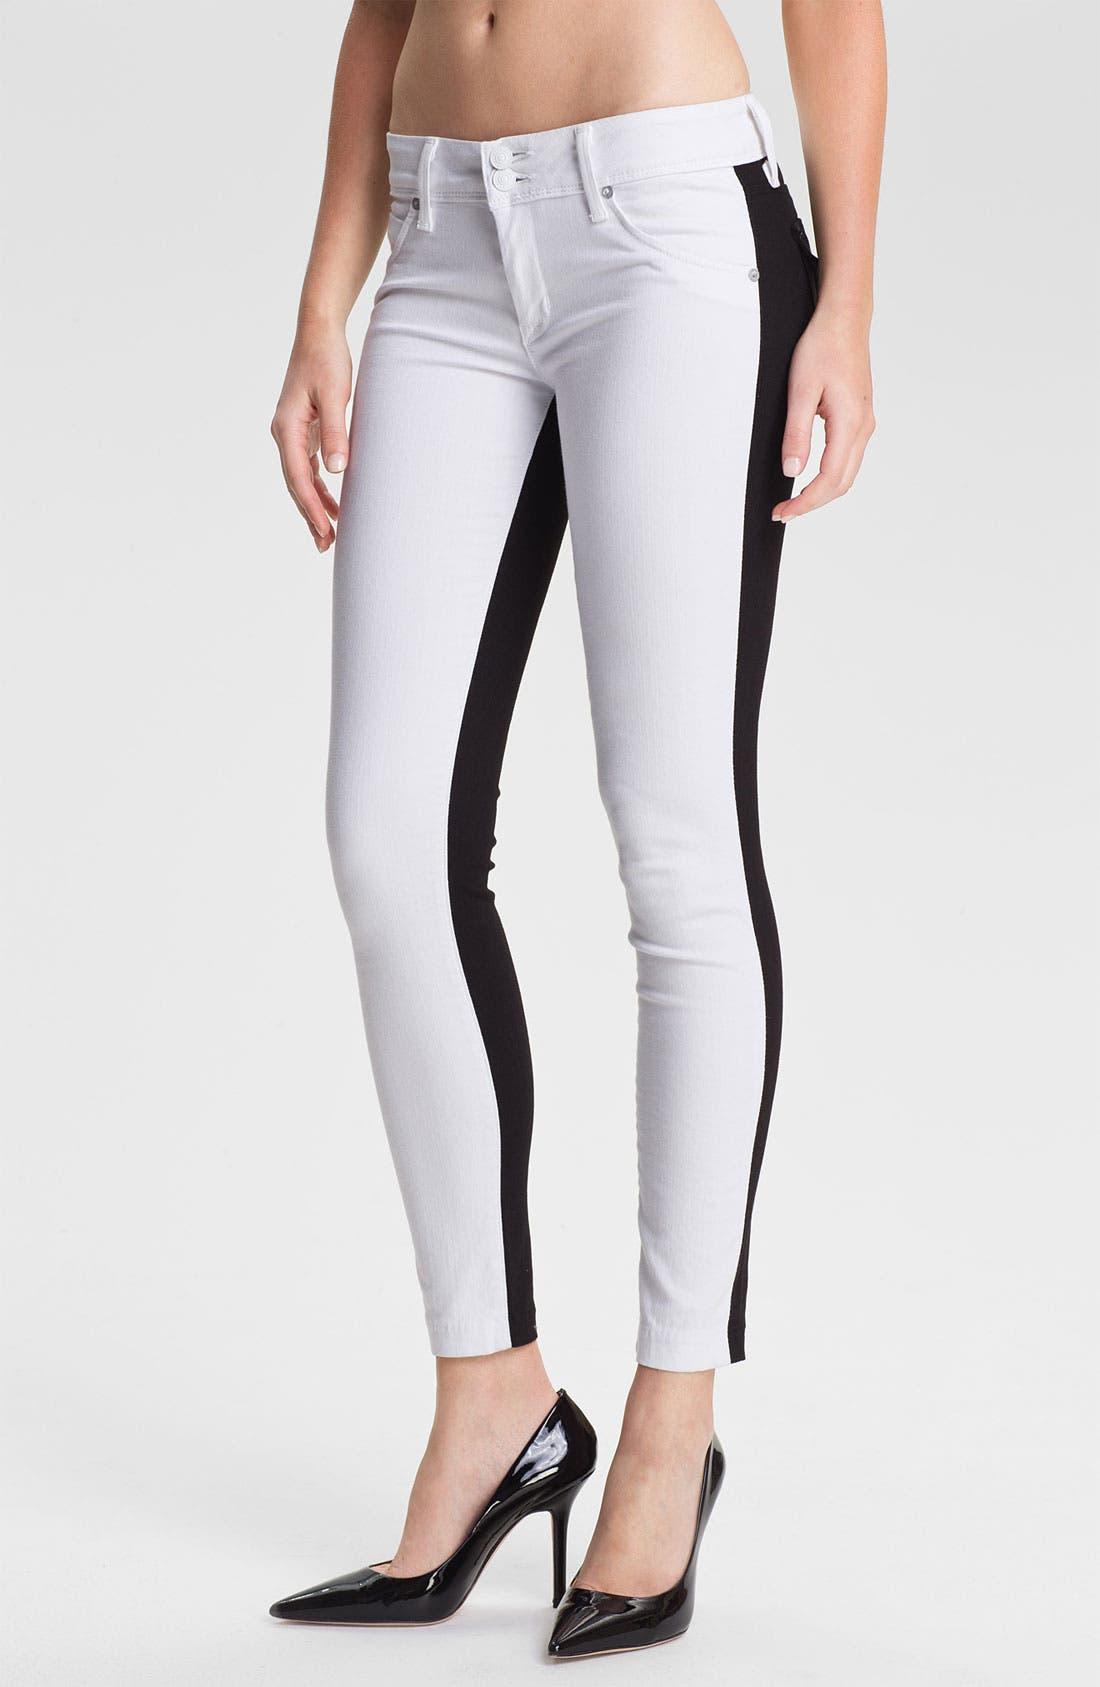 Main Image - Hudson Jeans 'Collin' Skinny Stretch Jeans (Vice Versa)